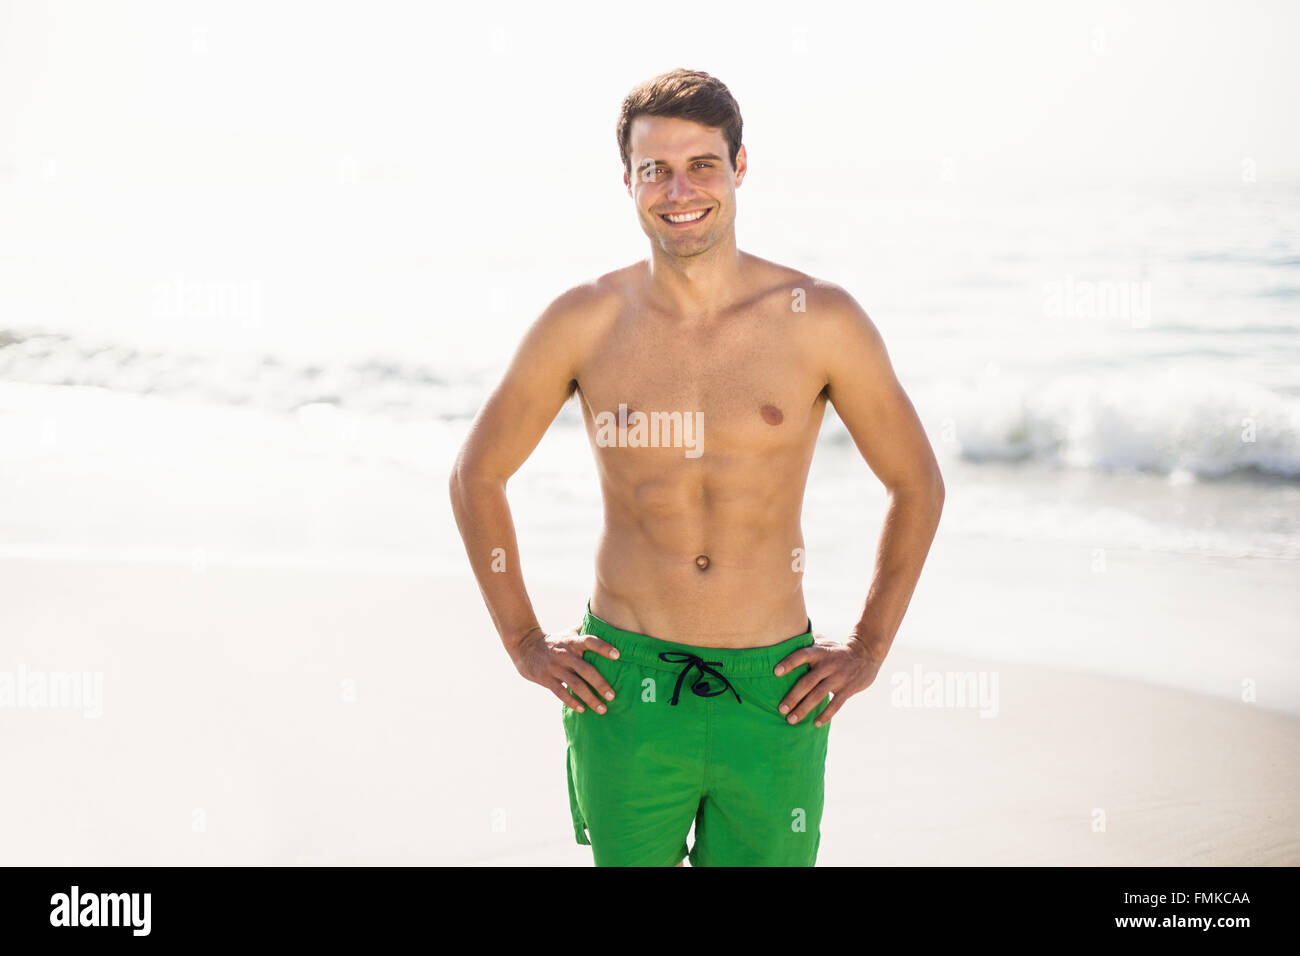 Portrait of man in swim shorts standing on beach - Stock Image